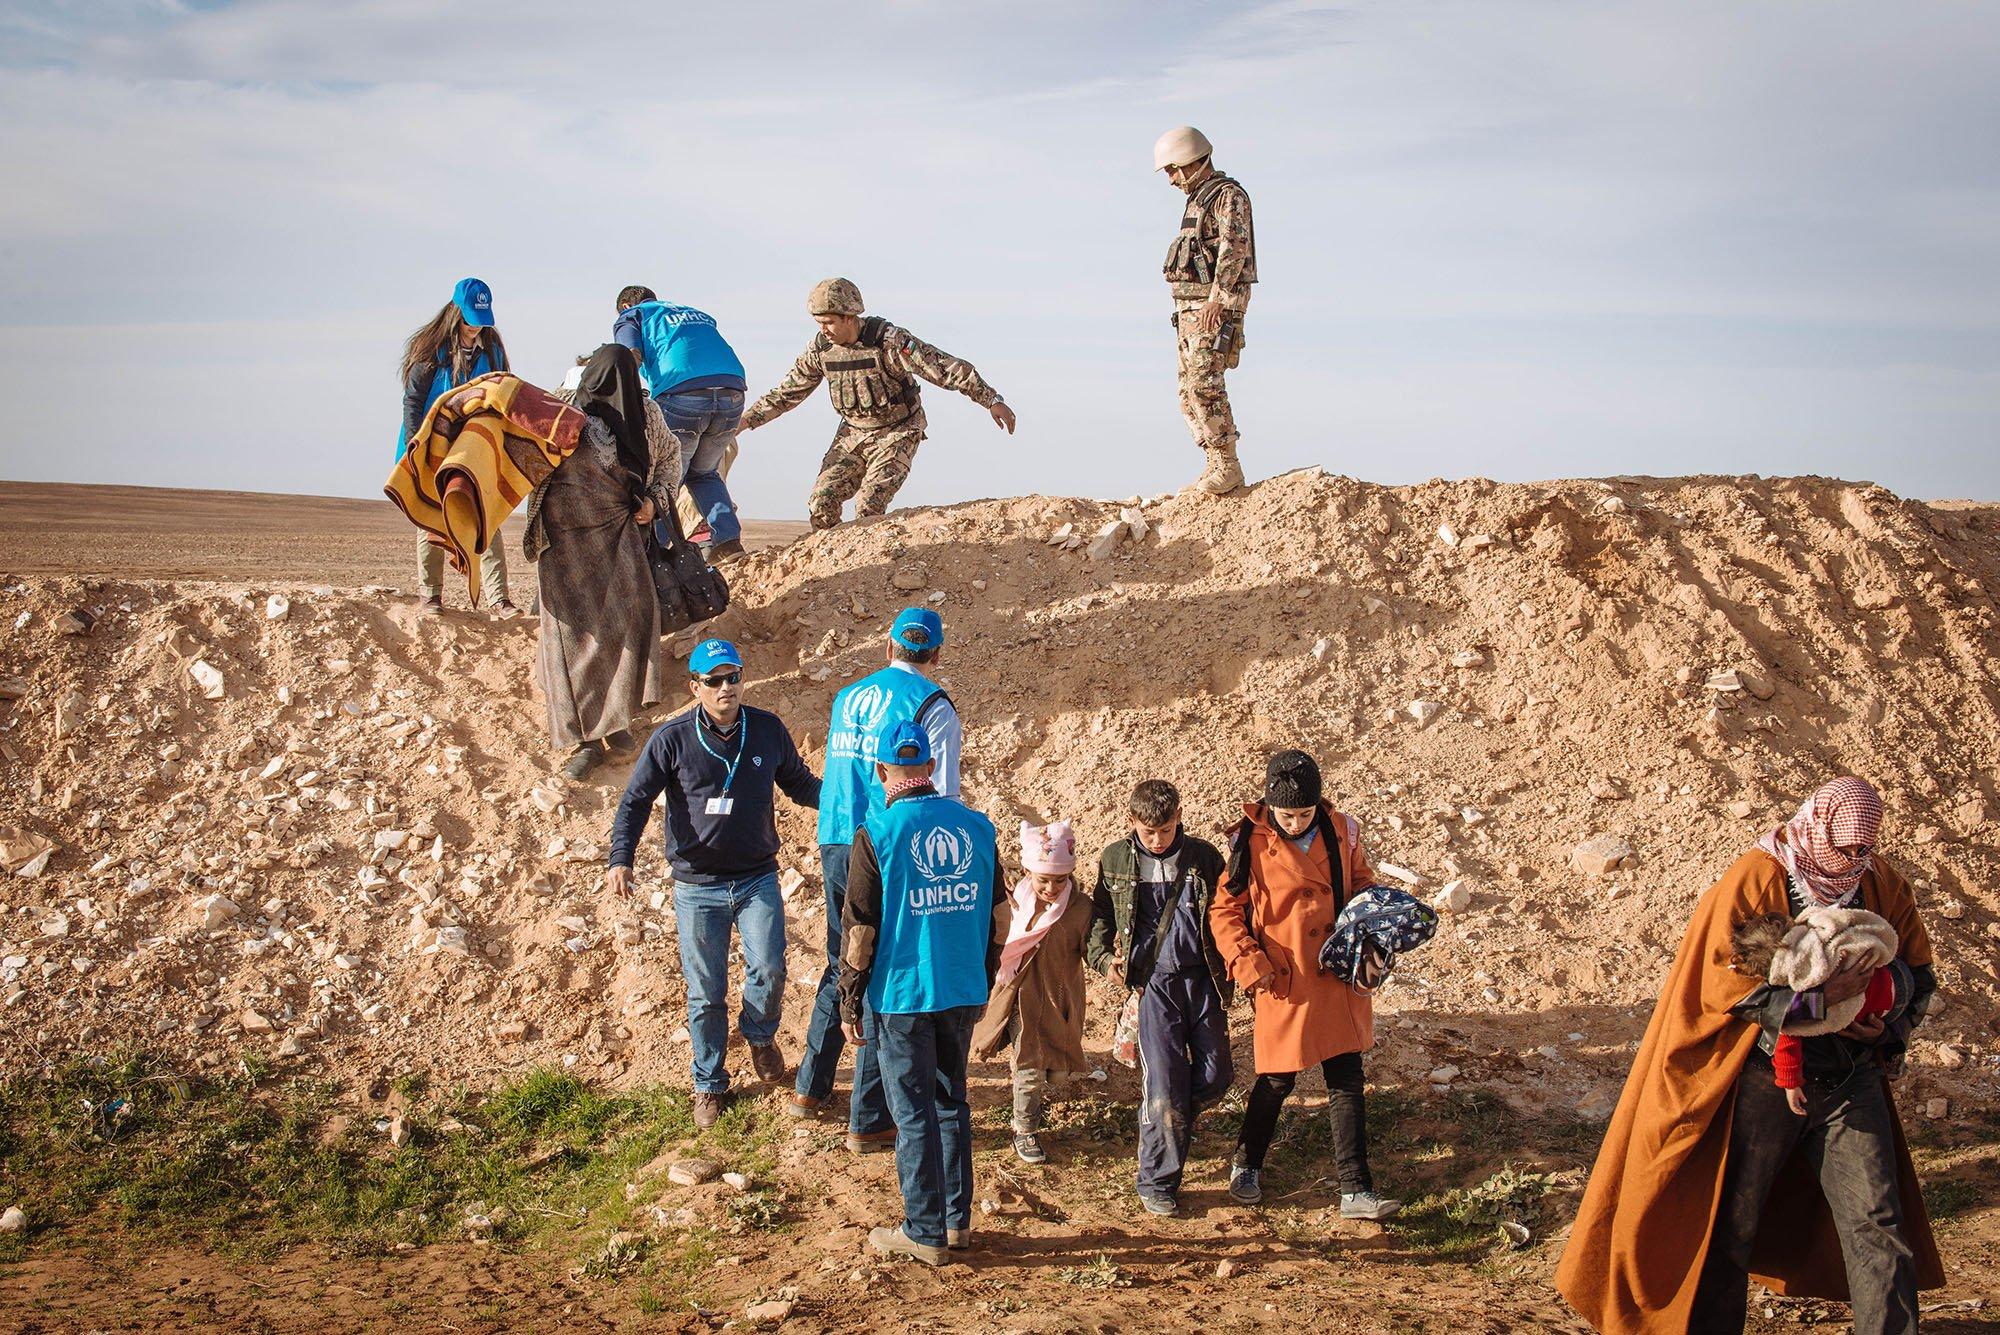 Syrian refugees walk the final metres across the desert toward the berm that marks the official Al-Ruwayshid Jordanian/Syrian border crossing. (UNHCR /J. Kohler)